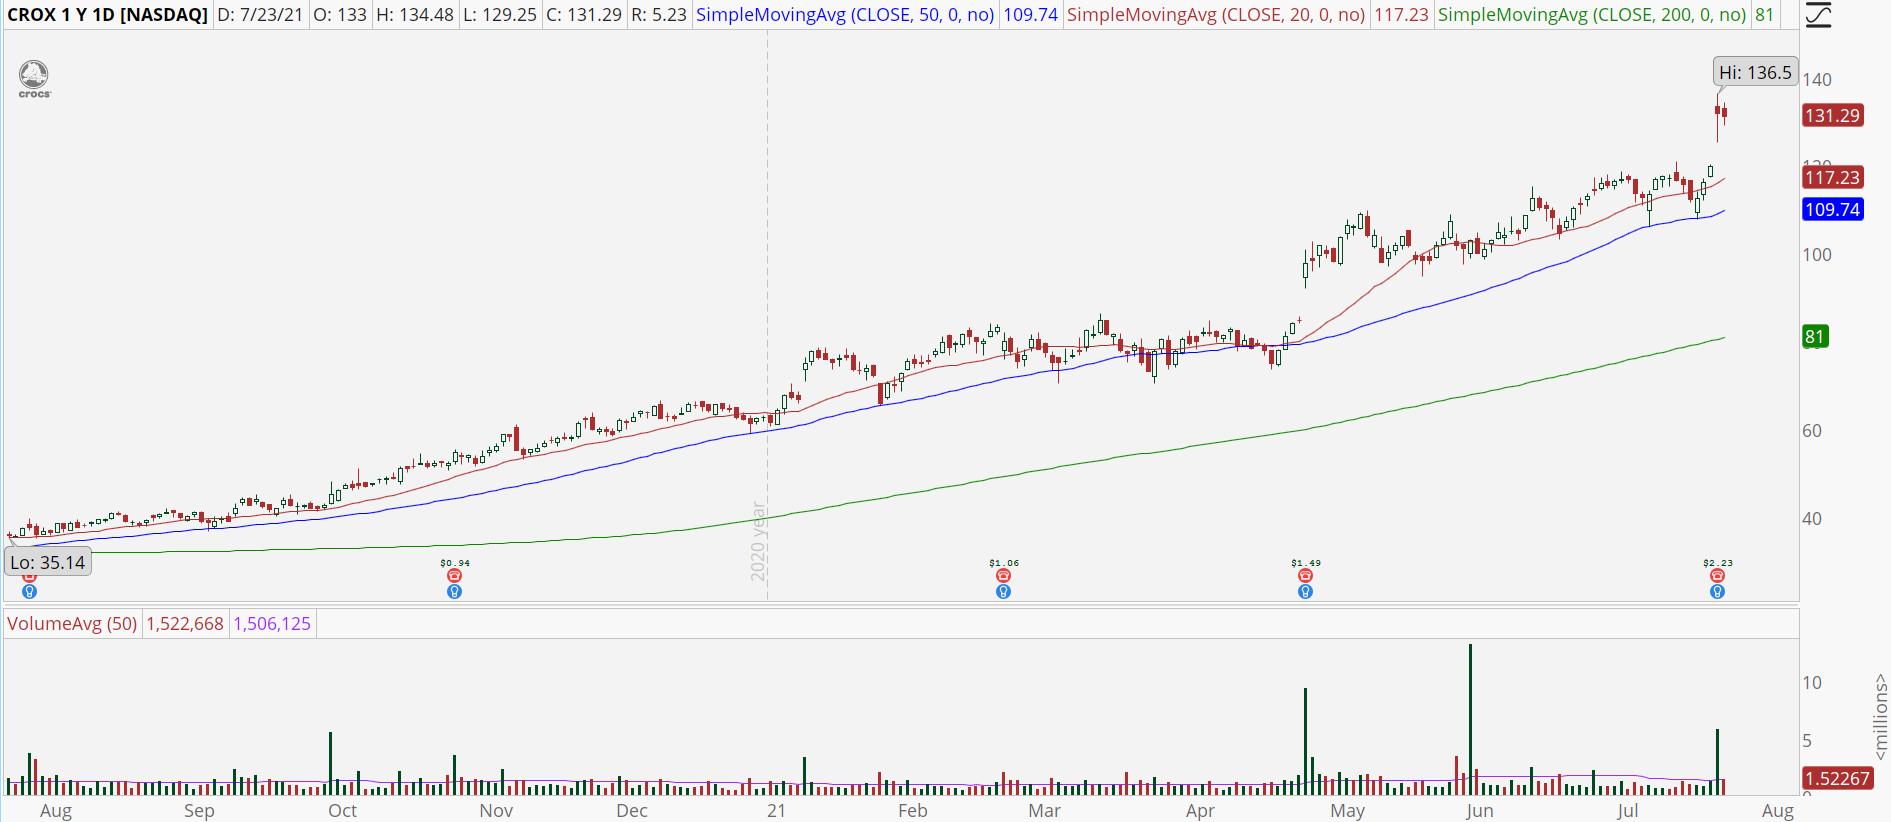 Crocs Inc (CROX) stock chart with powerful earnings gap.